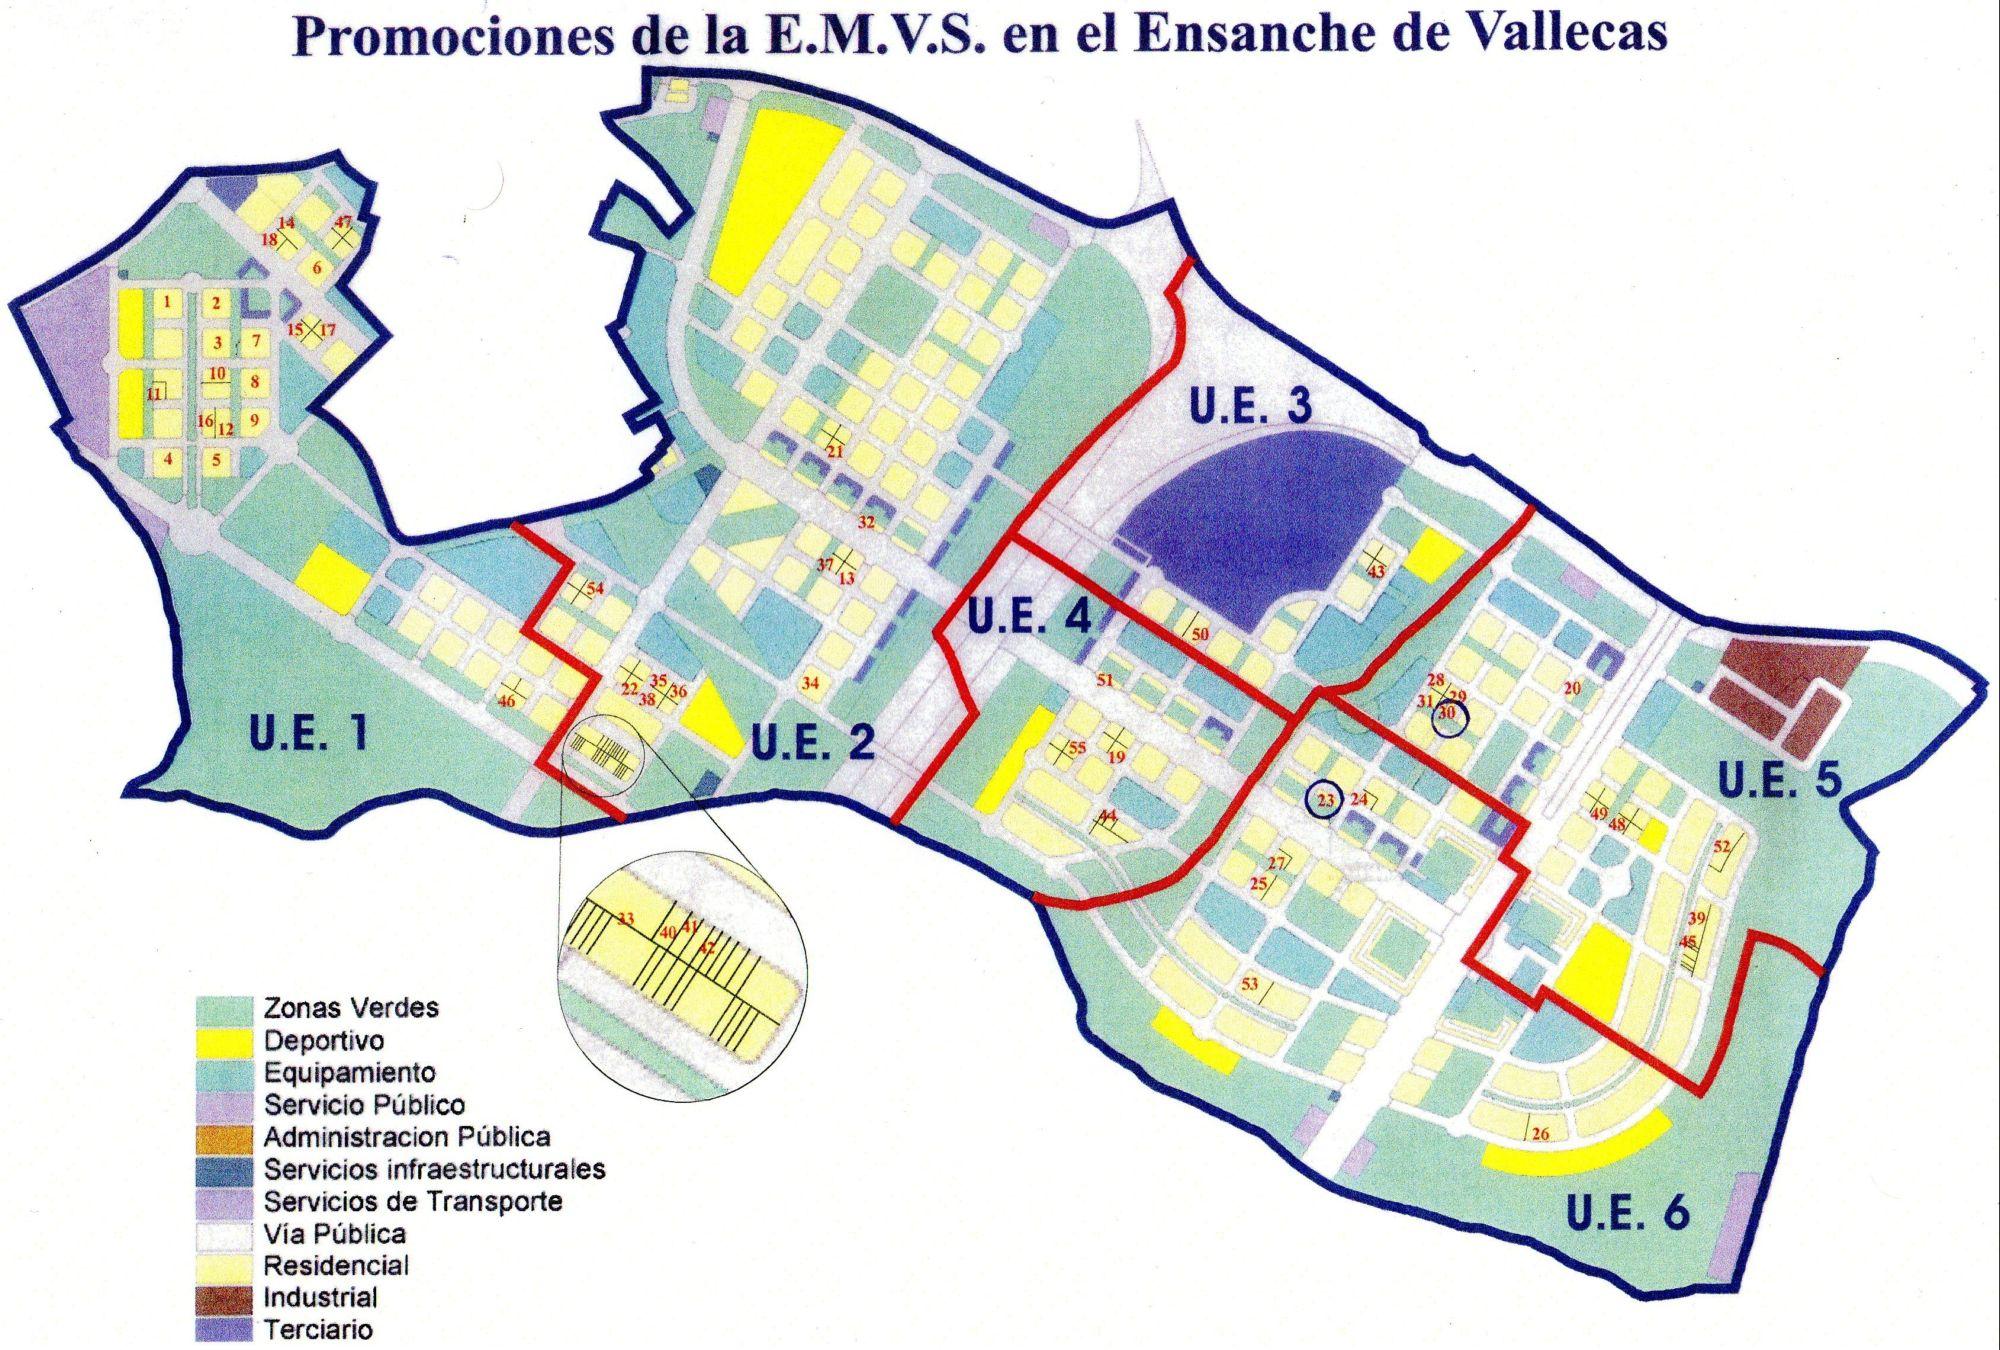 Emv 17 pau vallecas 23 documento promociones emvs - Ensanche de vallecas ...